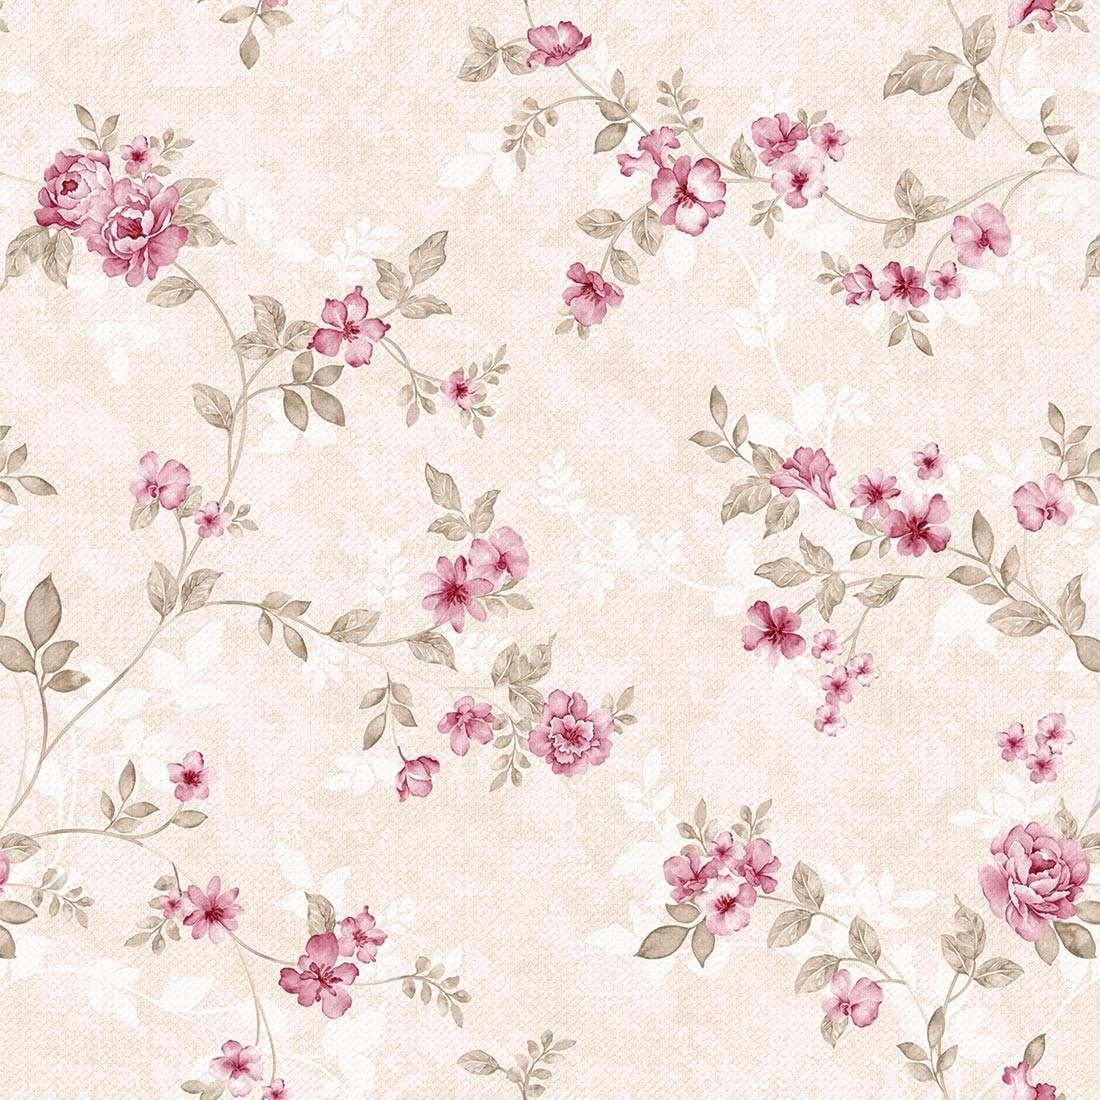 Papel de parede floral rosa adesivo contact vin lico - Papel vinilico para paredes ...